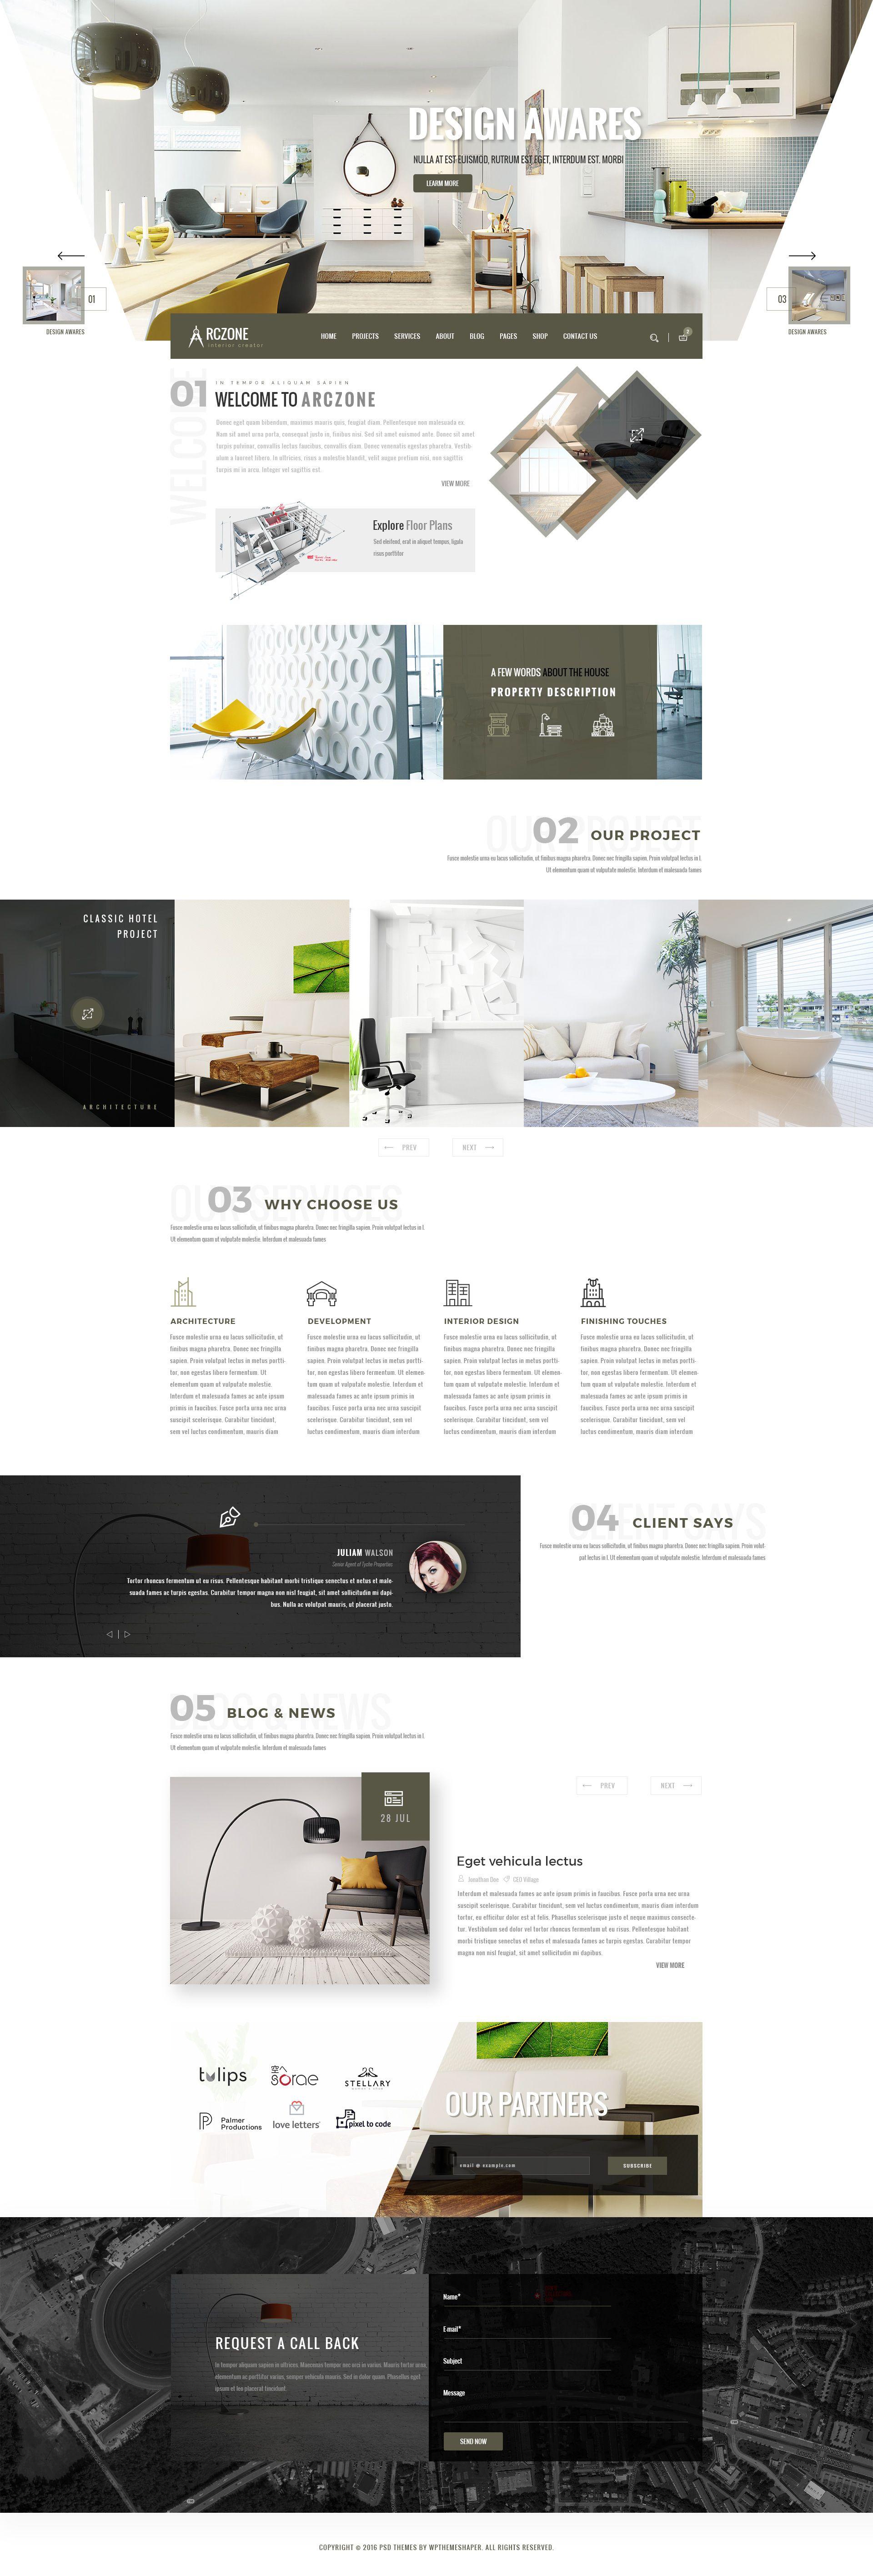 ARCZONE  Interior Design, Decor, Architecture Business Template. U2022 Download  ➝u2026